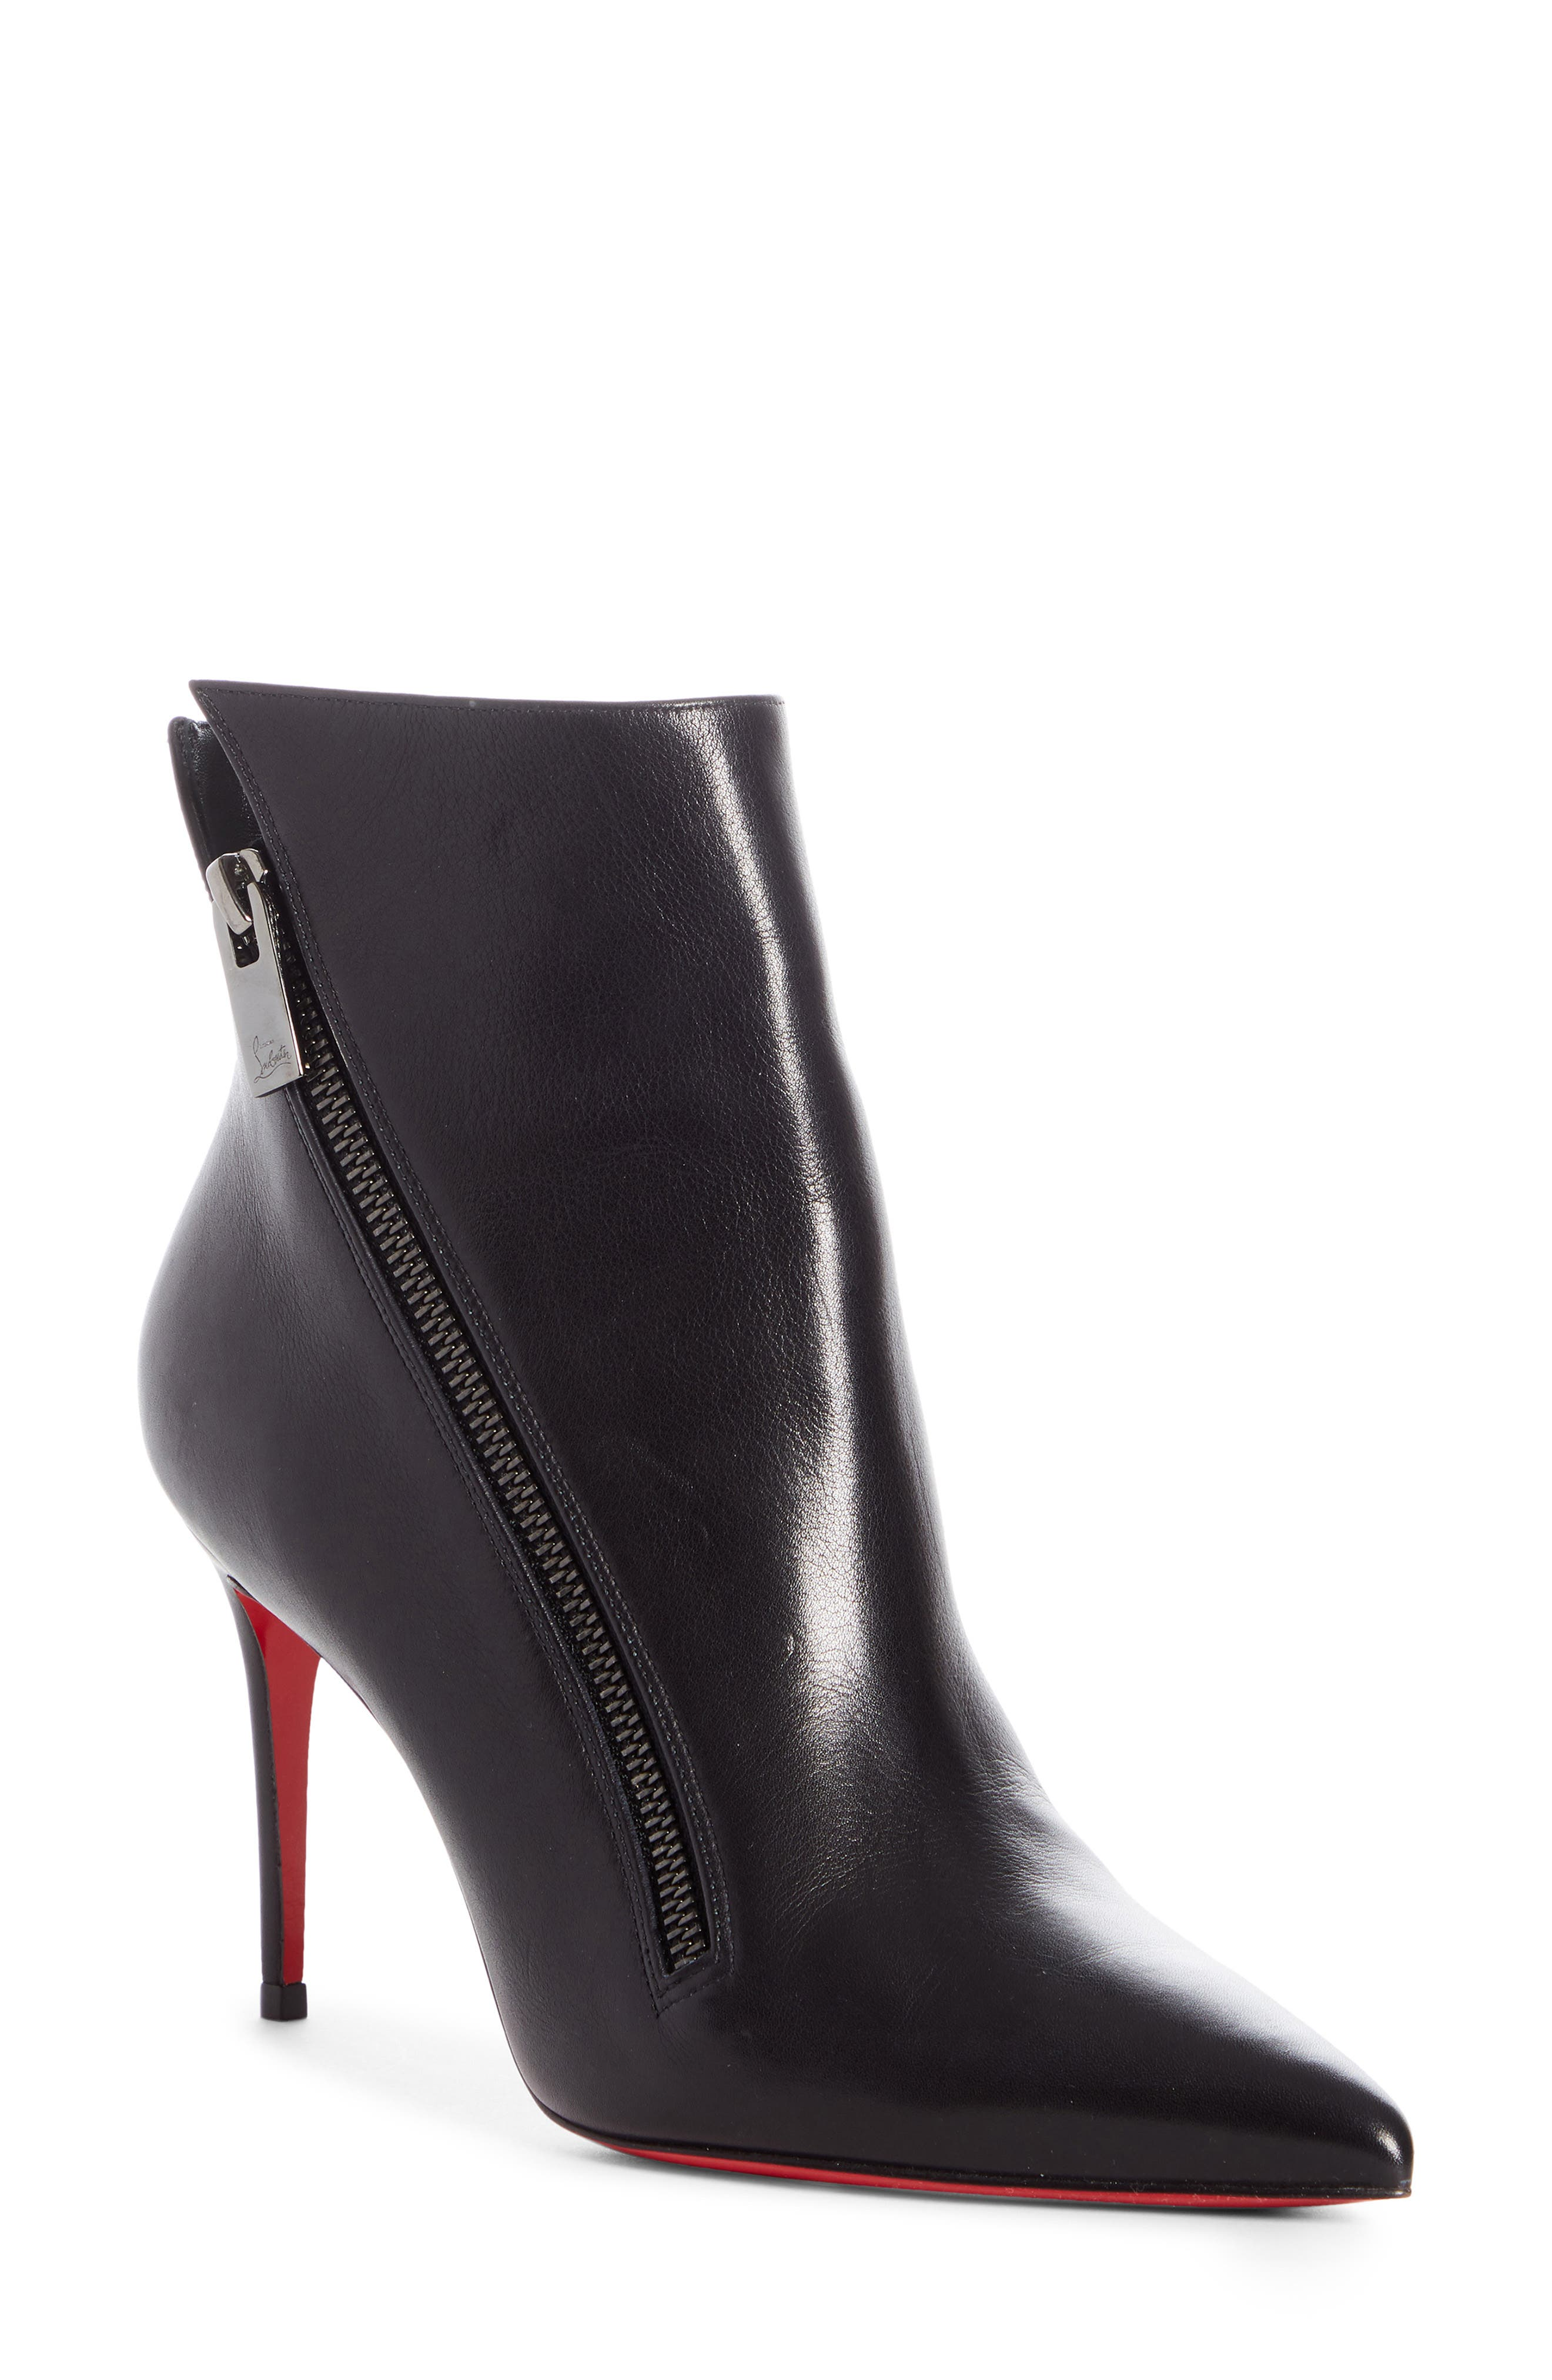 Women's Stiletto Booties \u0026 Ankle Boots